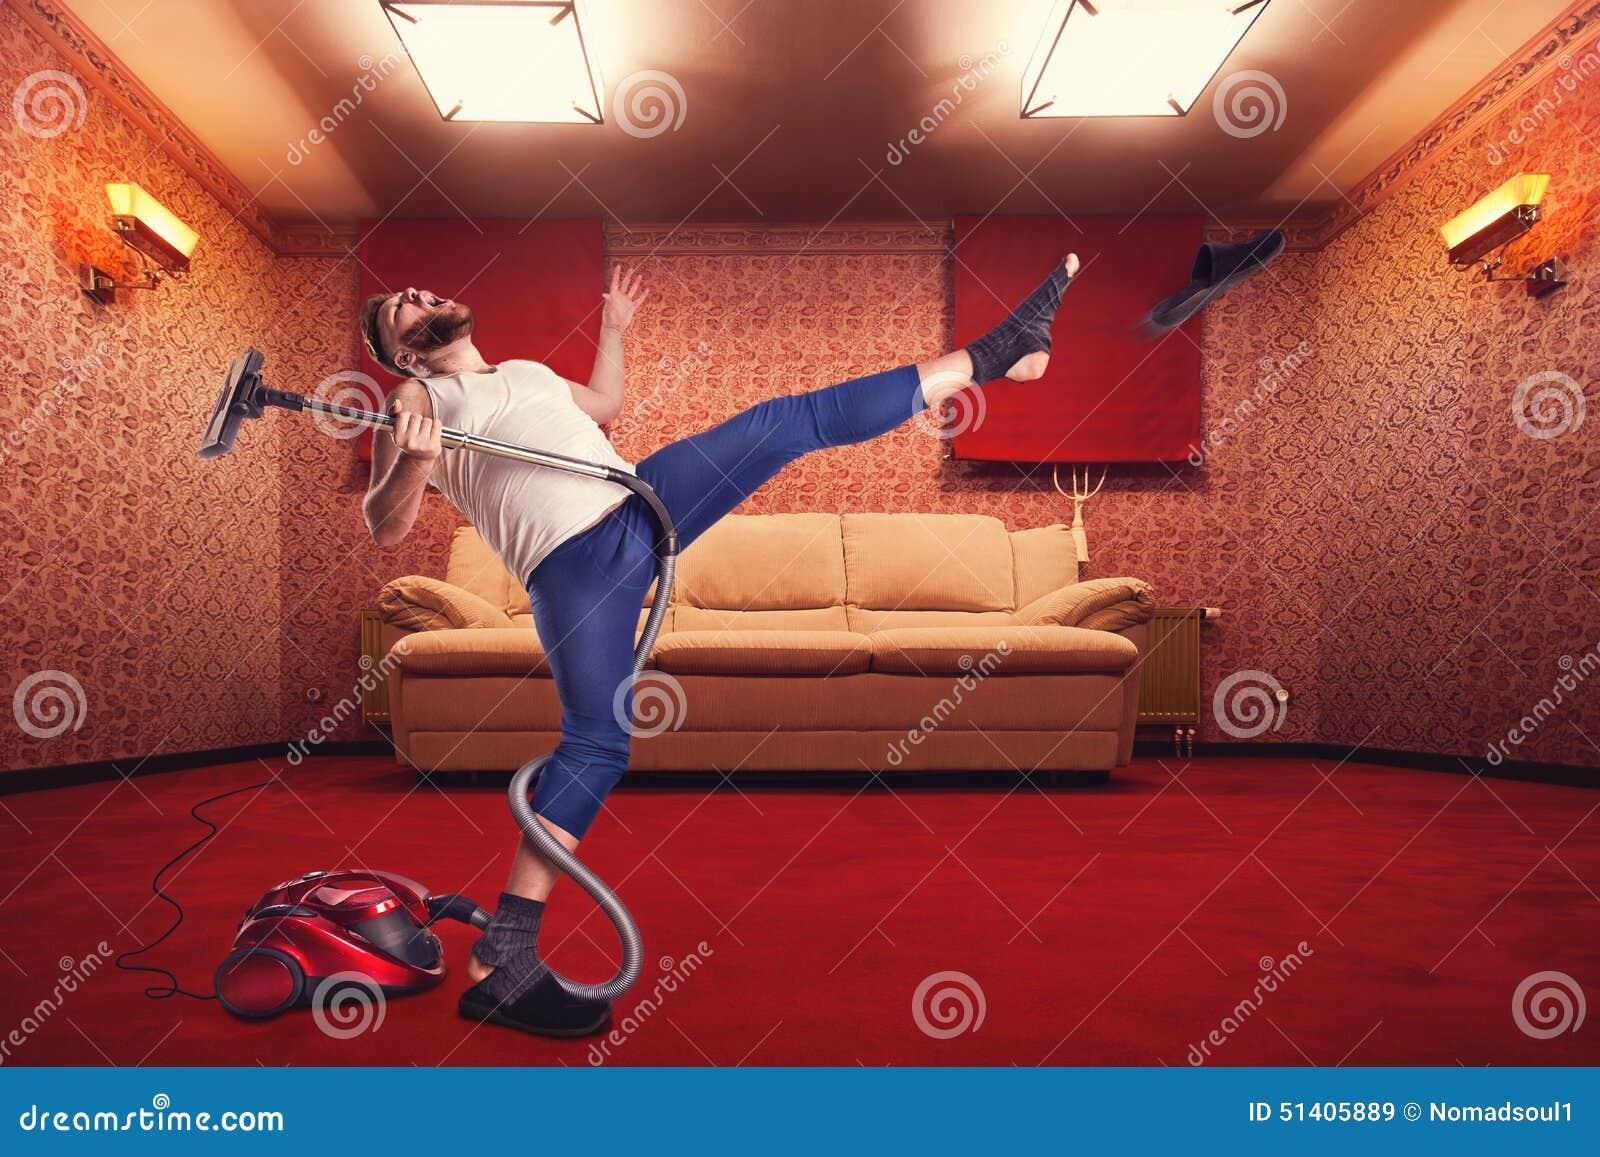 De volwassen reinigingsmachine van mensen dansende withvacuum